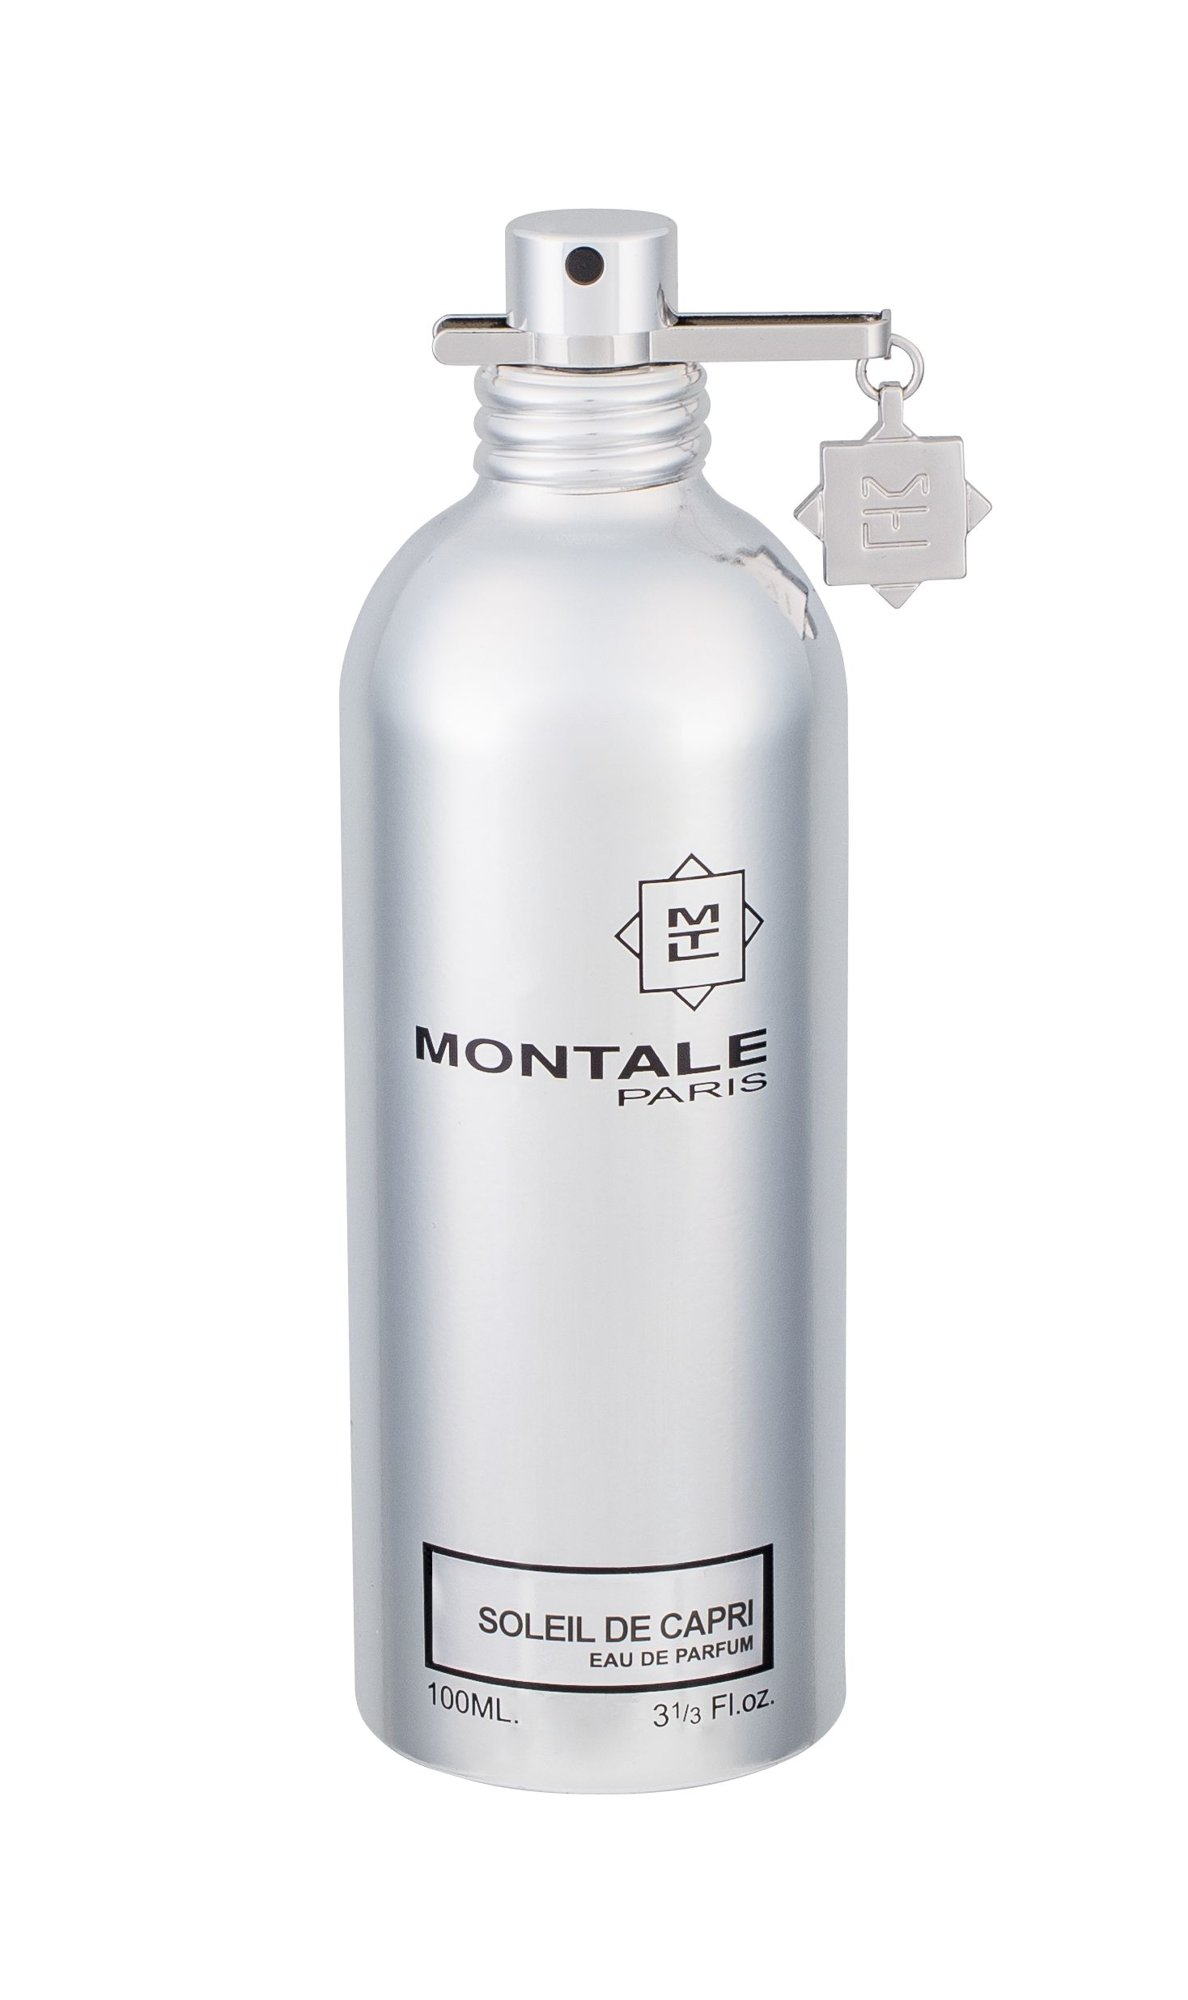 Montale Paris Soleil De Capri, edp 100ml